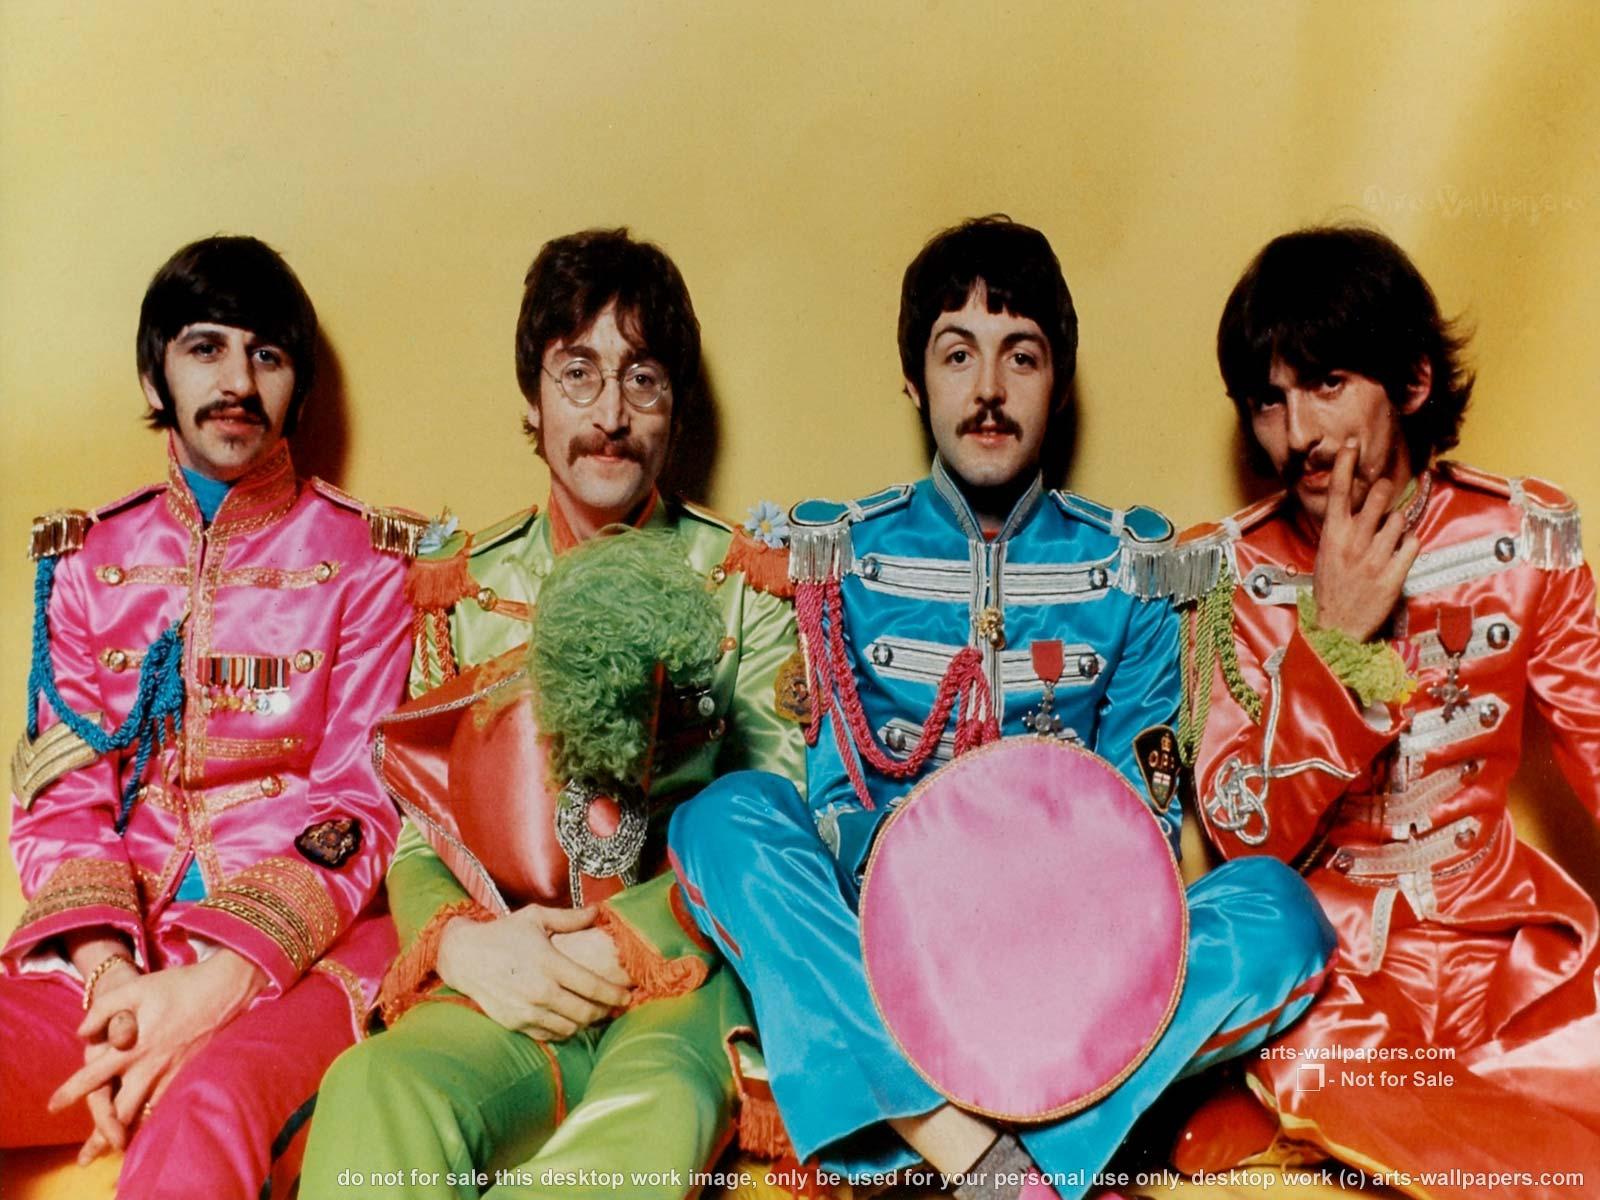 http://3.bp.blogspot.com/-86c4brZvl2g/TZ9sJHIBafI/AAAAAAAAAIk/mf5nU4T16RA/s1600/The-Beatles-Sgt.jpg